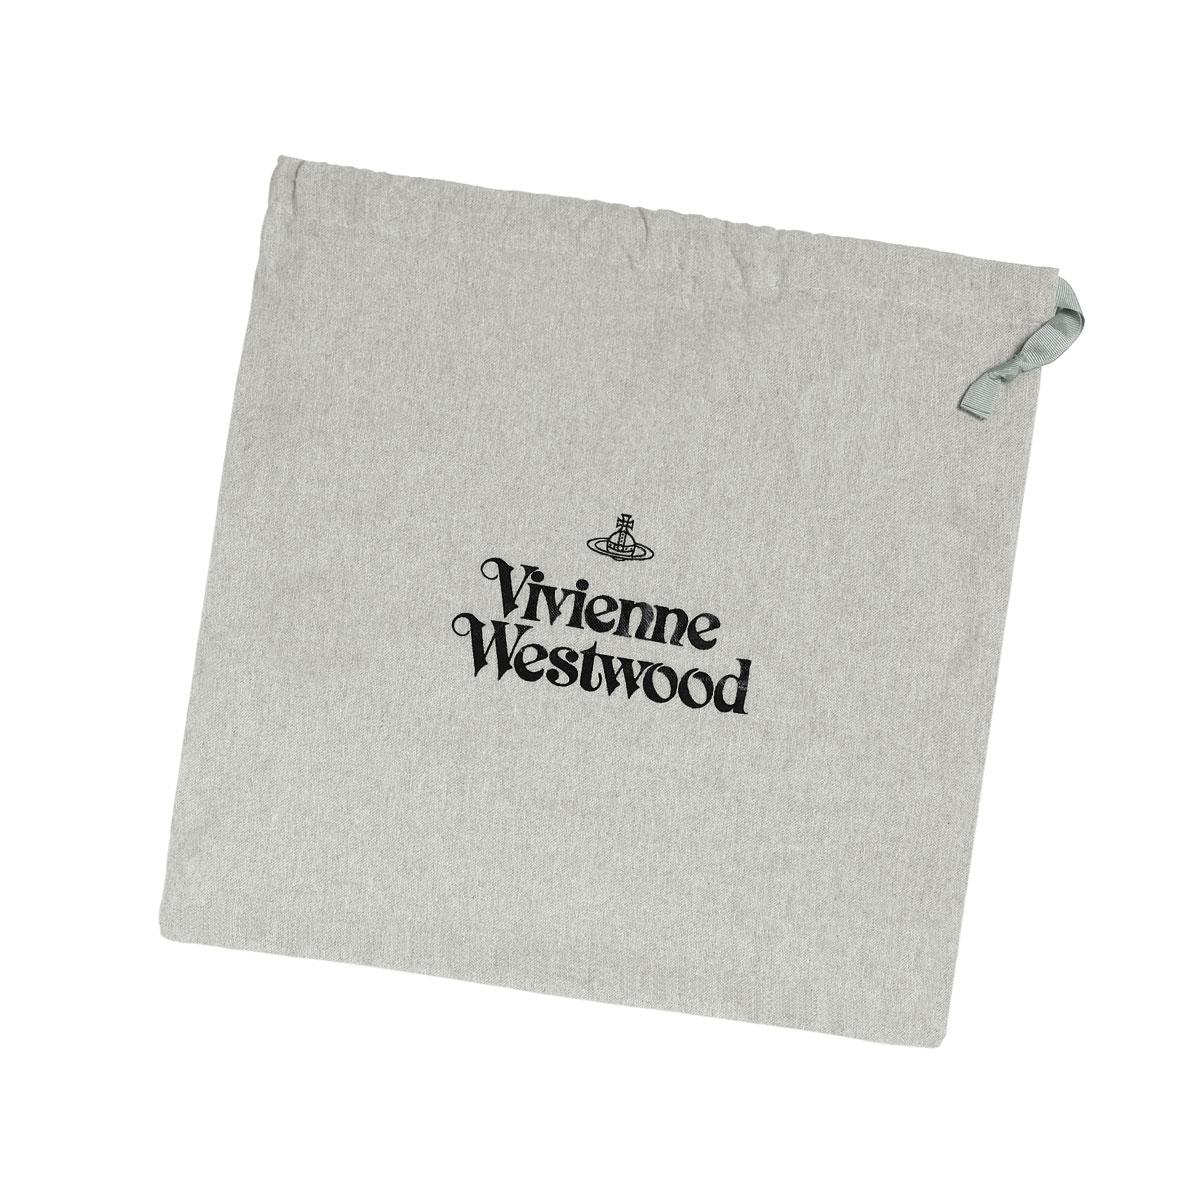 VIVIENNE WESTWOOD ヴィヴィアン ウエストウッド | ショルダー付 ハンドバッグ | EMMA エマ